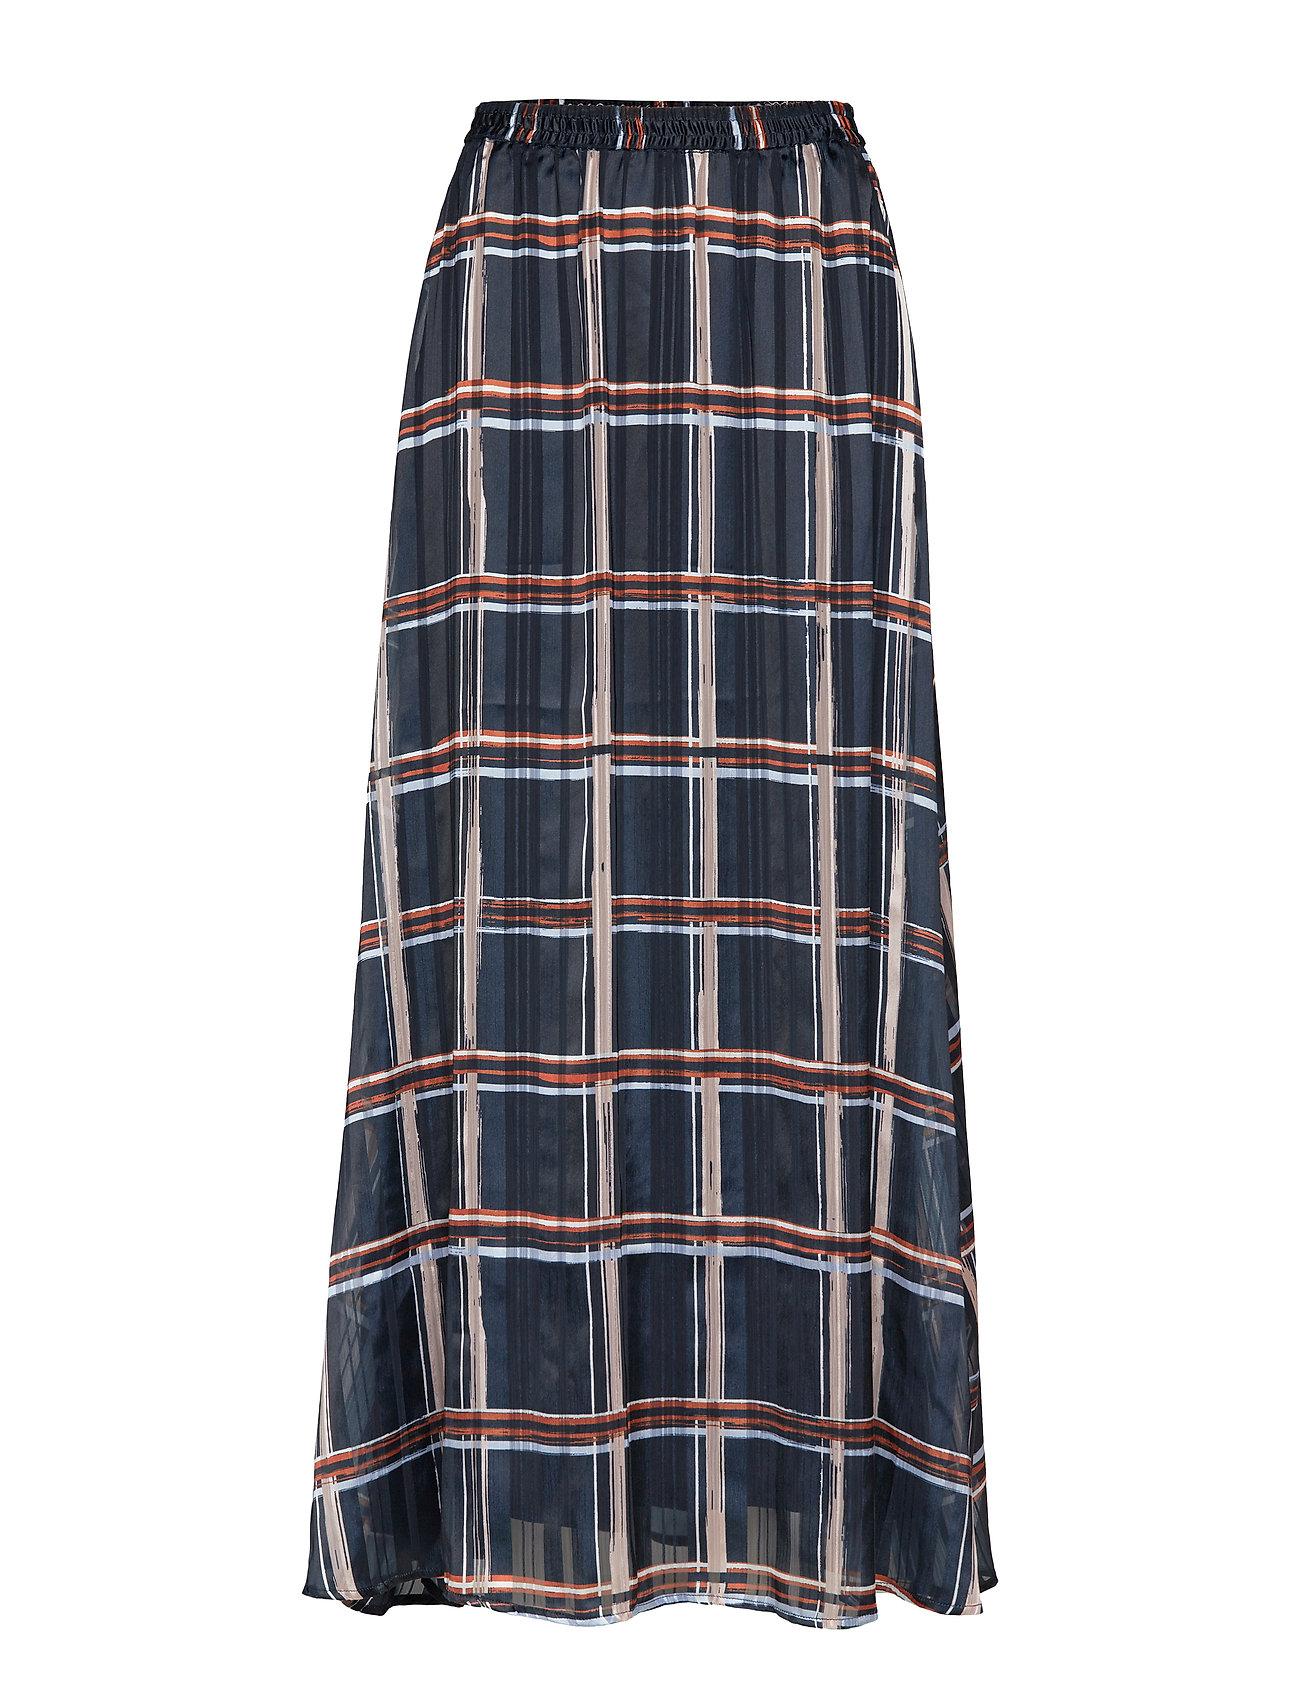 InWear ZilmaIW Hilma Skirt - MARINE BLUE CHECK